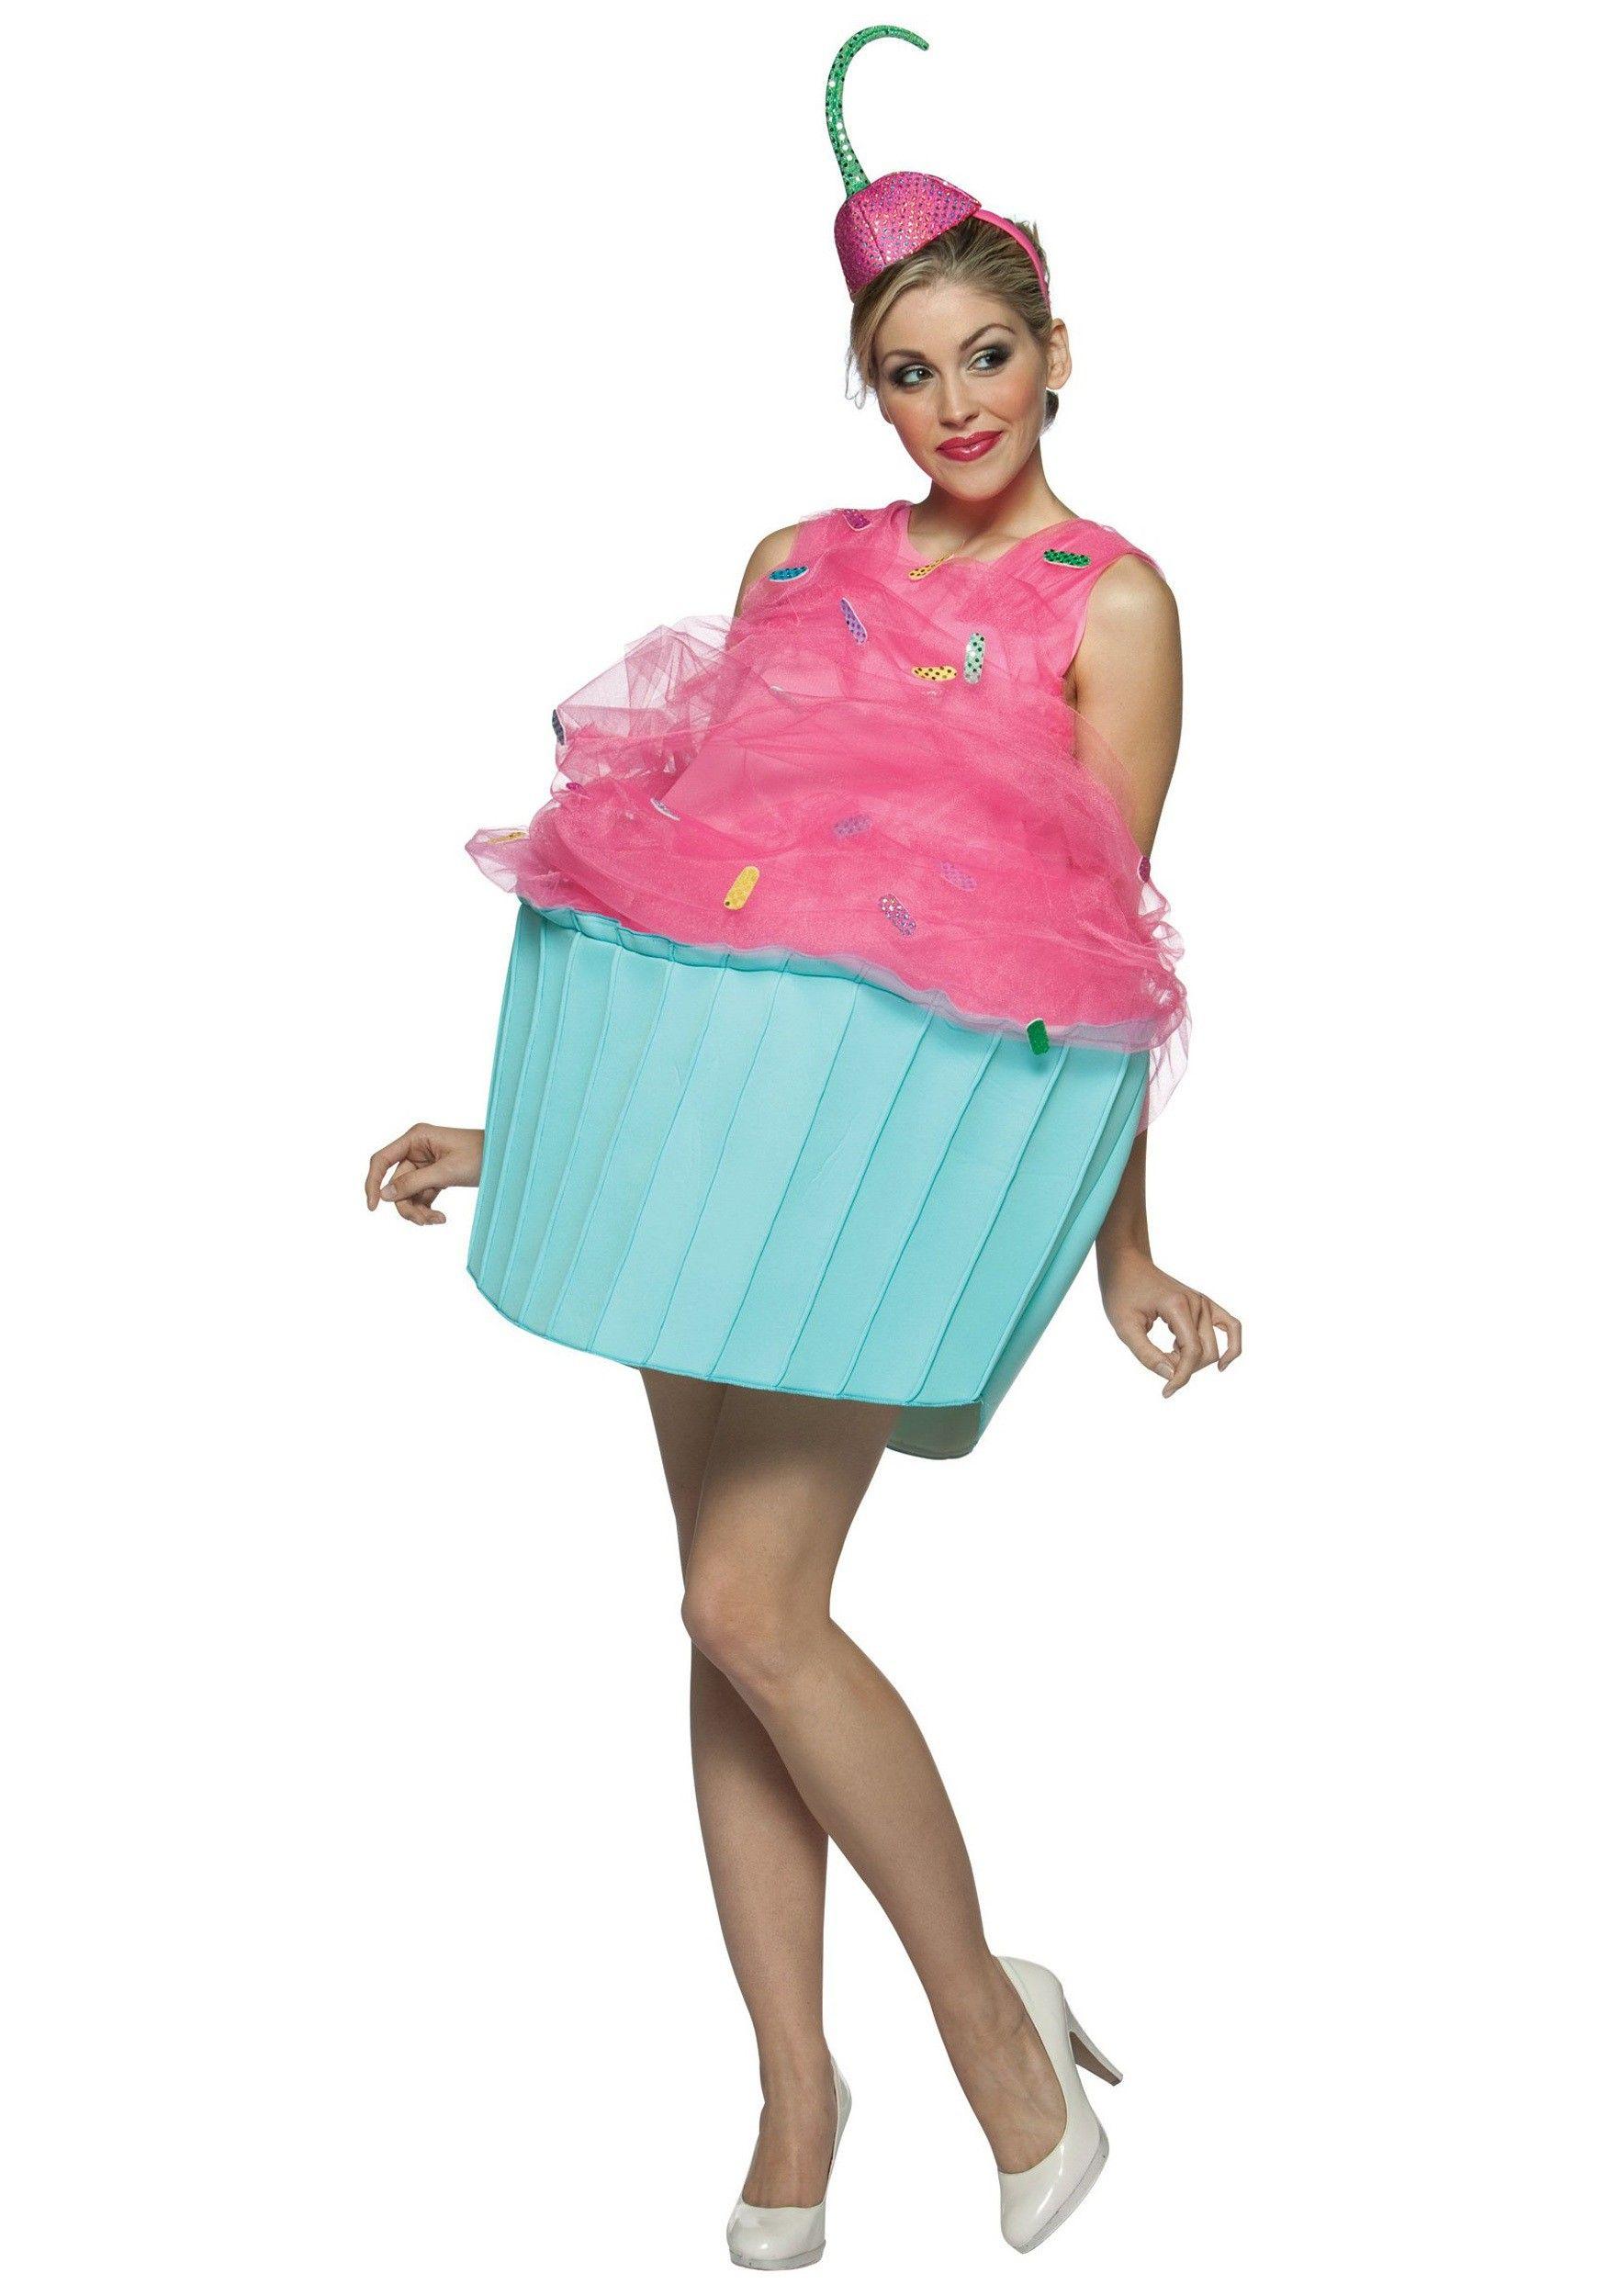 Fantasia Feminina Cupcake Criativa Traje para Festa a Fantasia